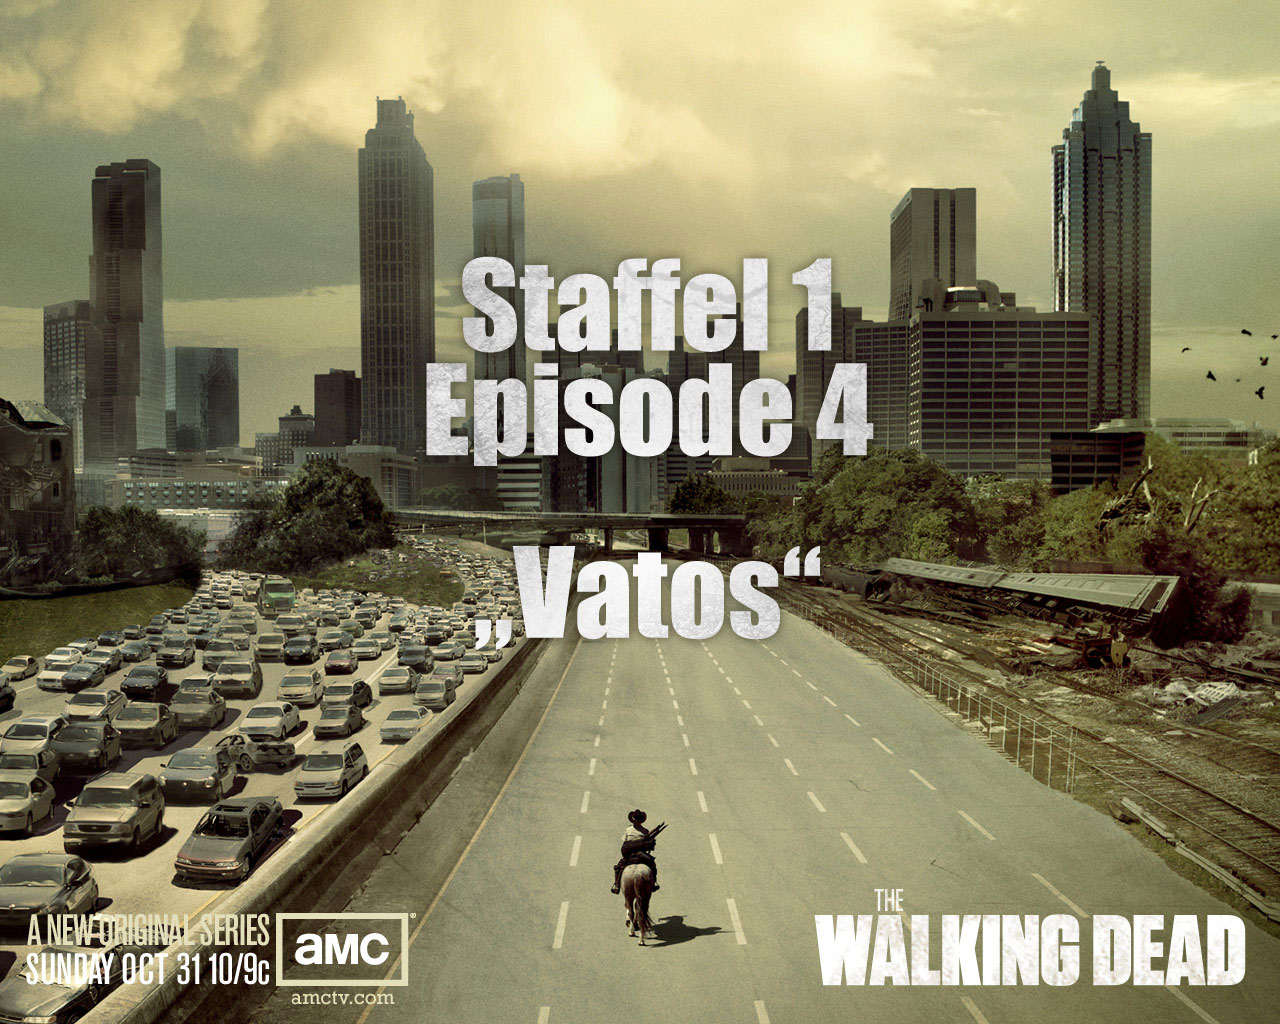 The Walking Dead S01E04 – Vatos